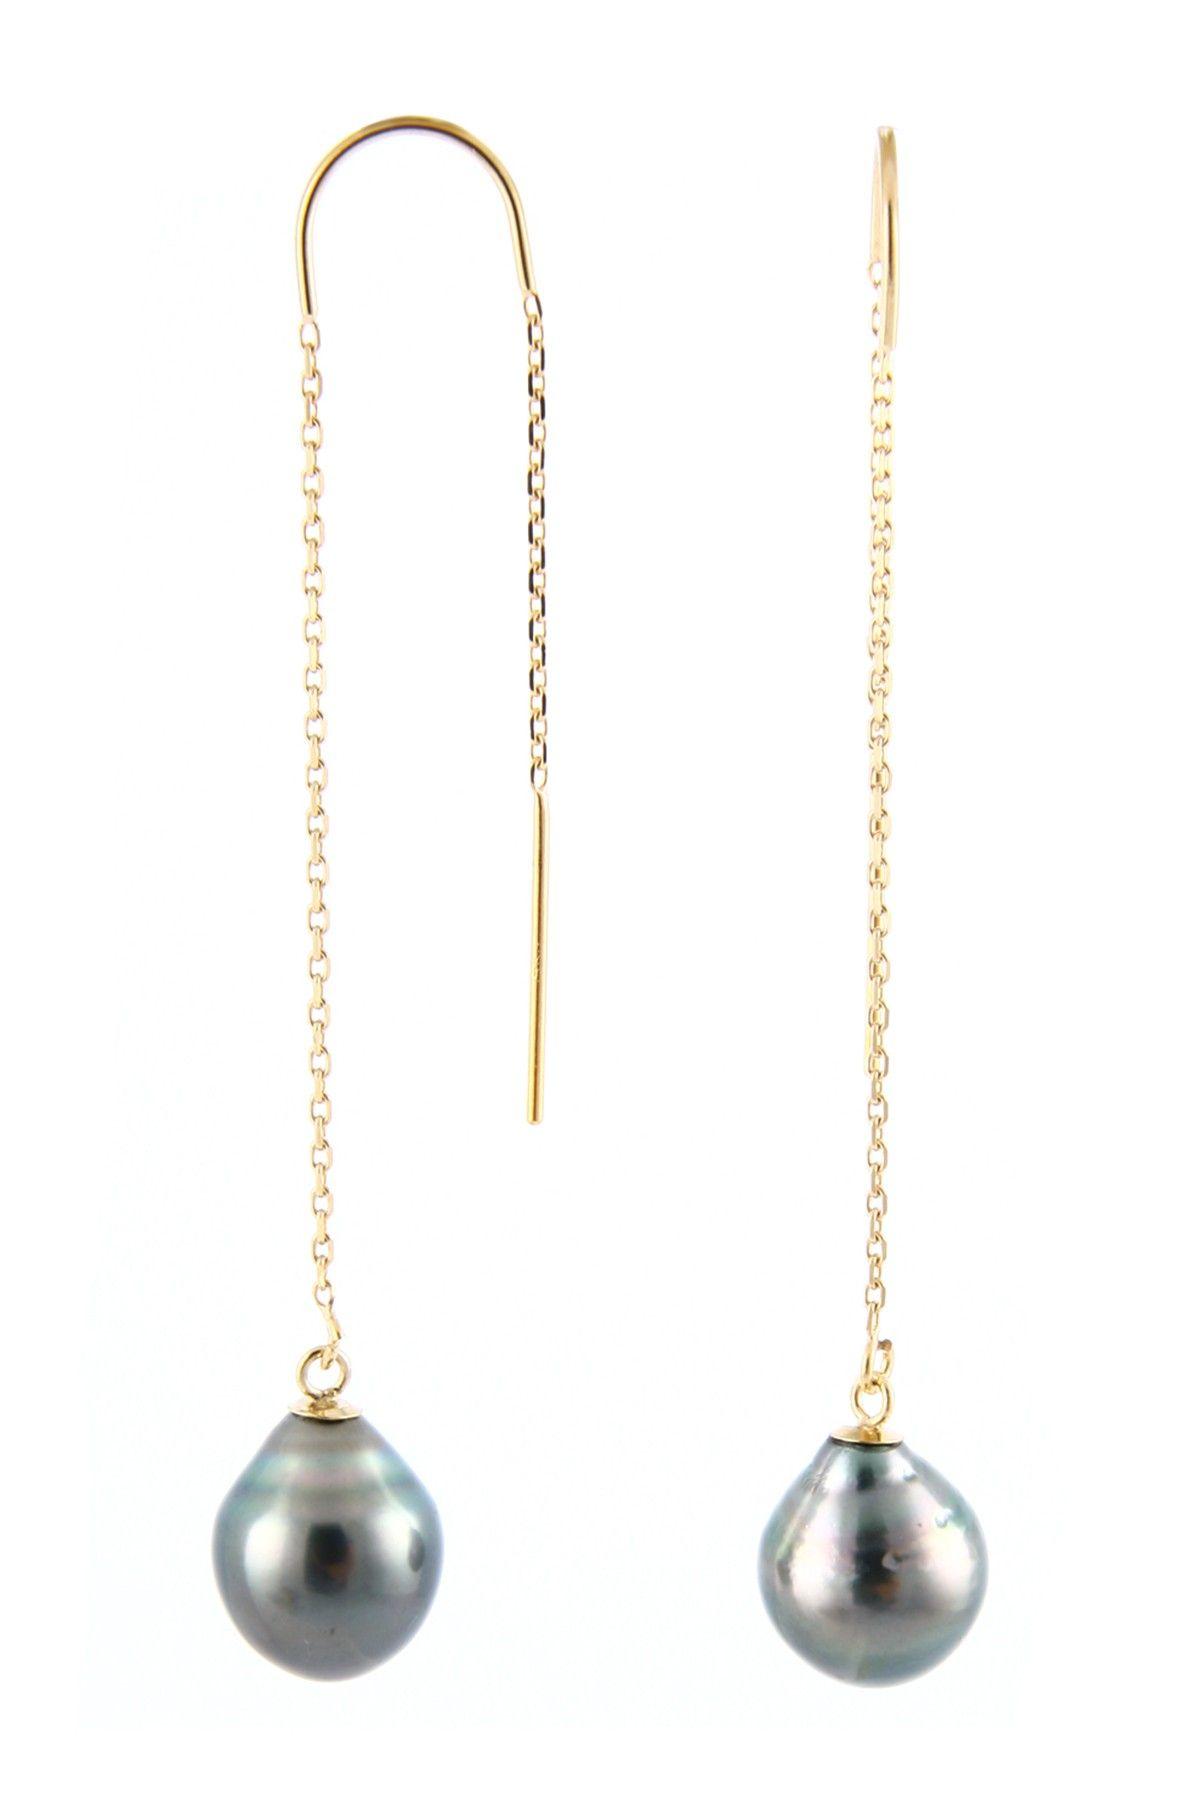 587ad4921dc Splendid Pearls 14K Yellow Gold 7.5-8mm Tahitian Pearl Threader ...